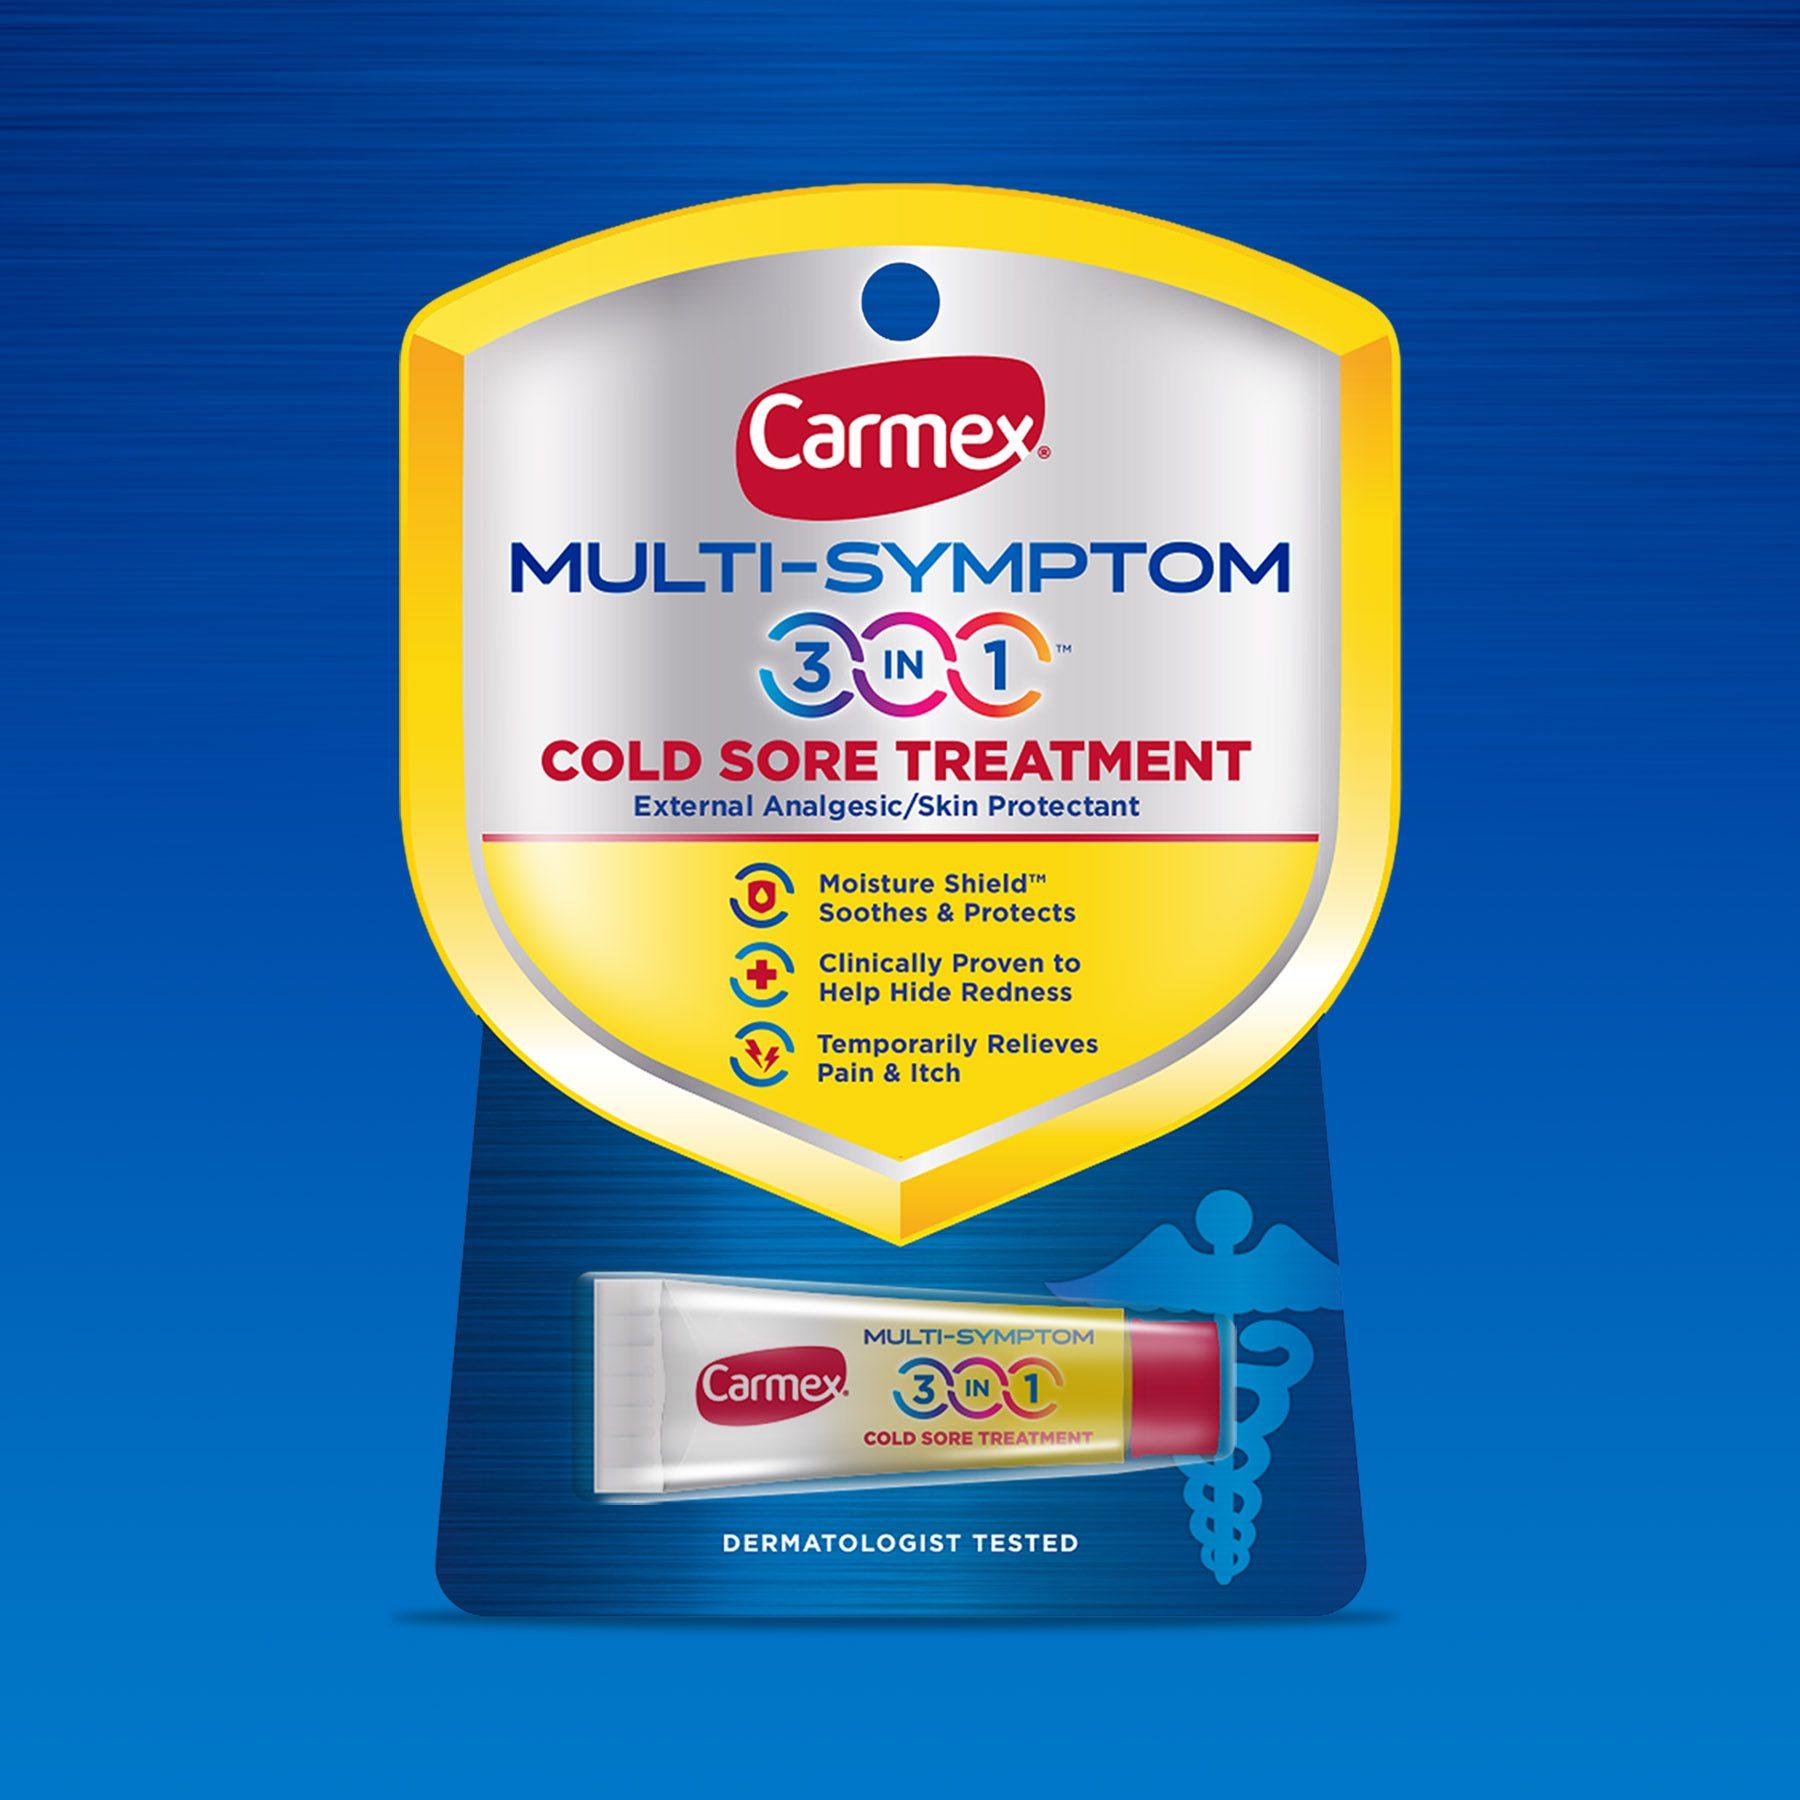 Carmex Multi-Symptom Front View